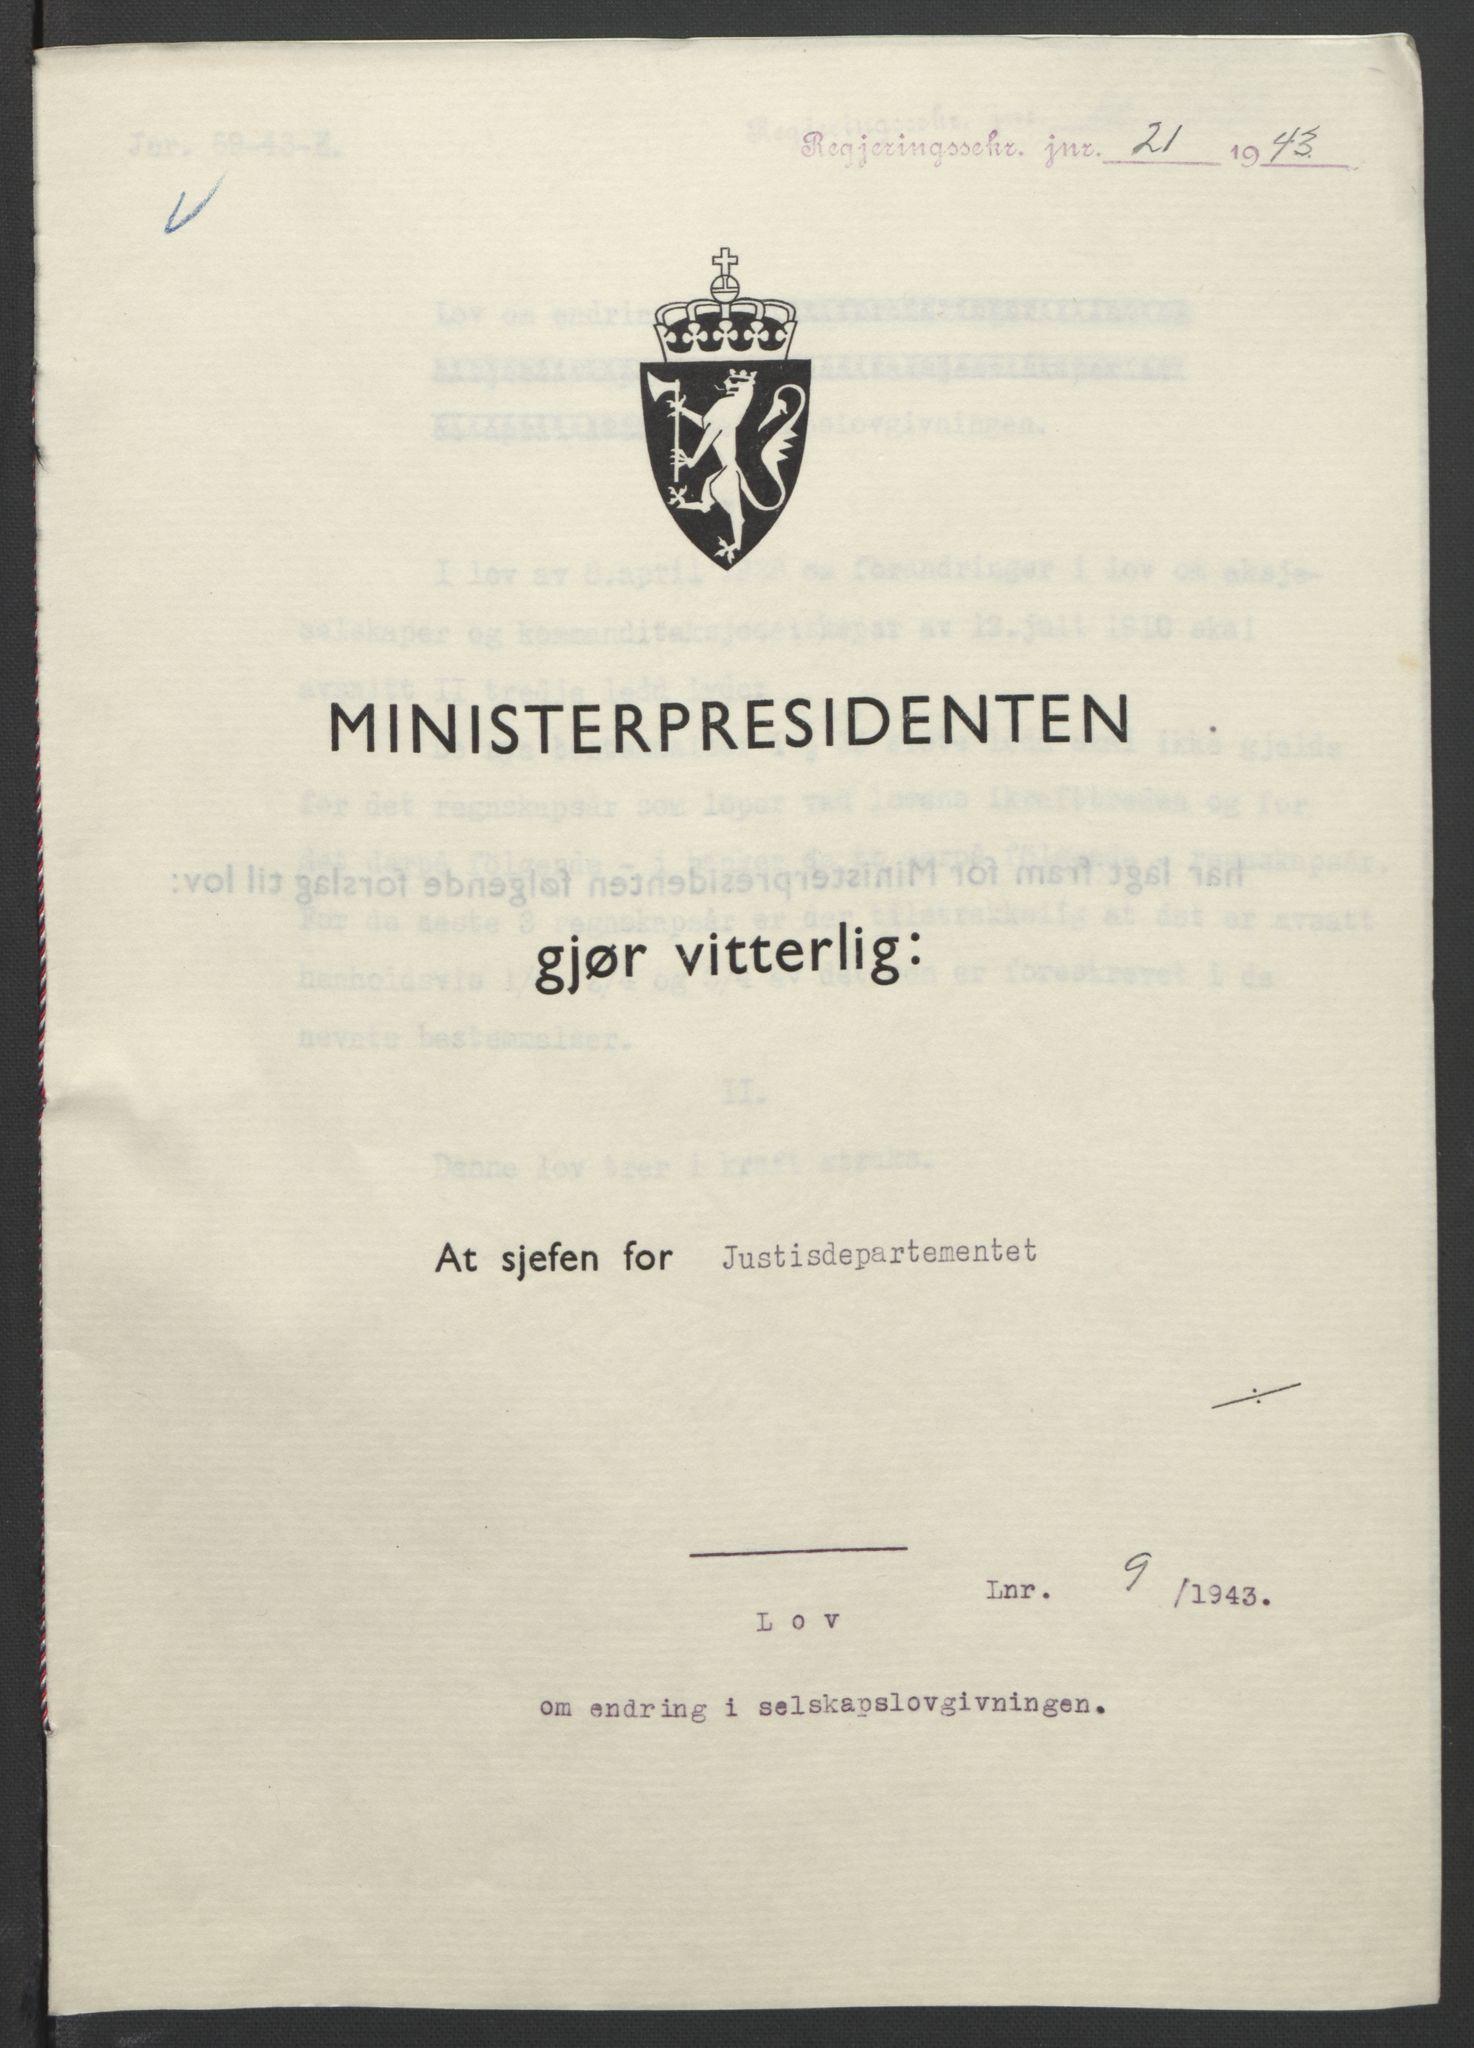 RA, NS-administrasjonen 1940-1945 (Statsrådsekretariatet, de kommisariske statsråder mm), D/Db/L0099: Lover, 1943, s. 36